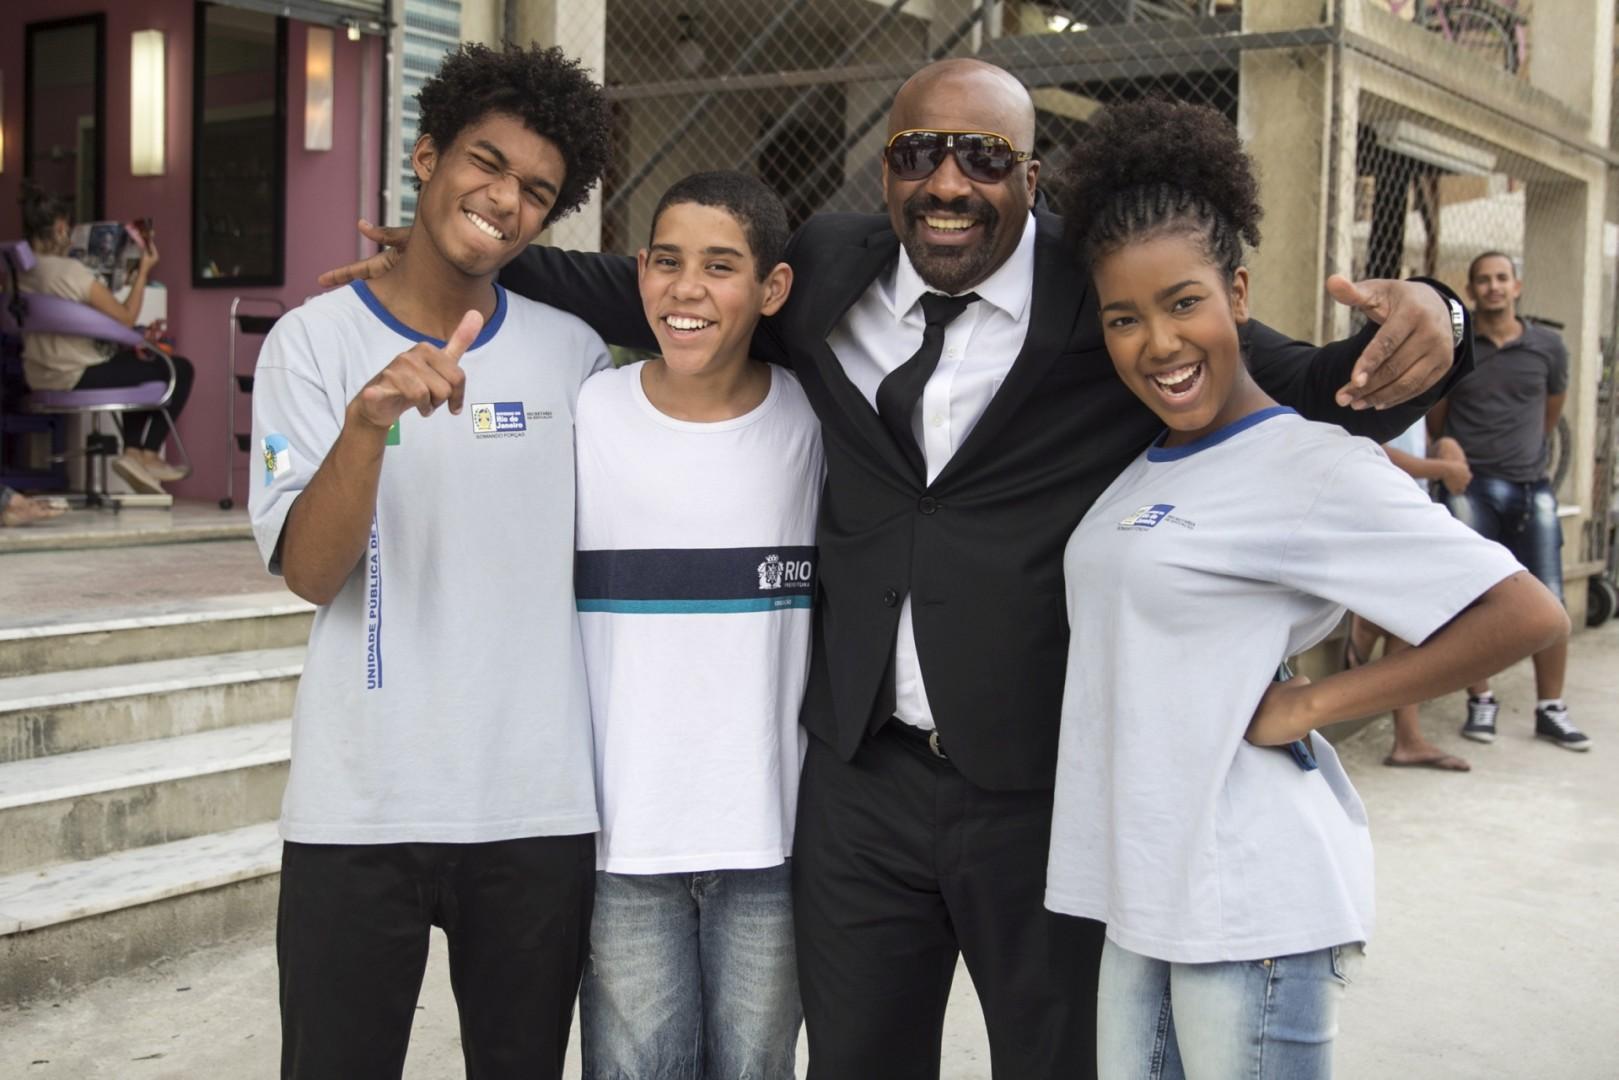 Wesley (Juan Paiva), Bola (Cauê Campos), Florisval (Aílton Graça) e Jennifer (Lellezinha)